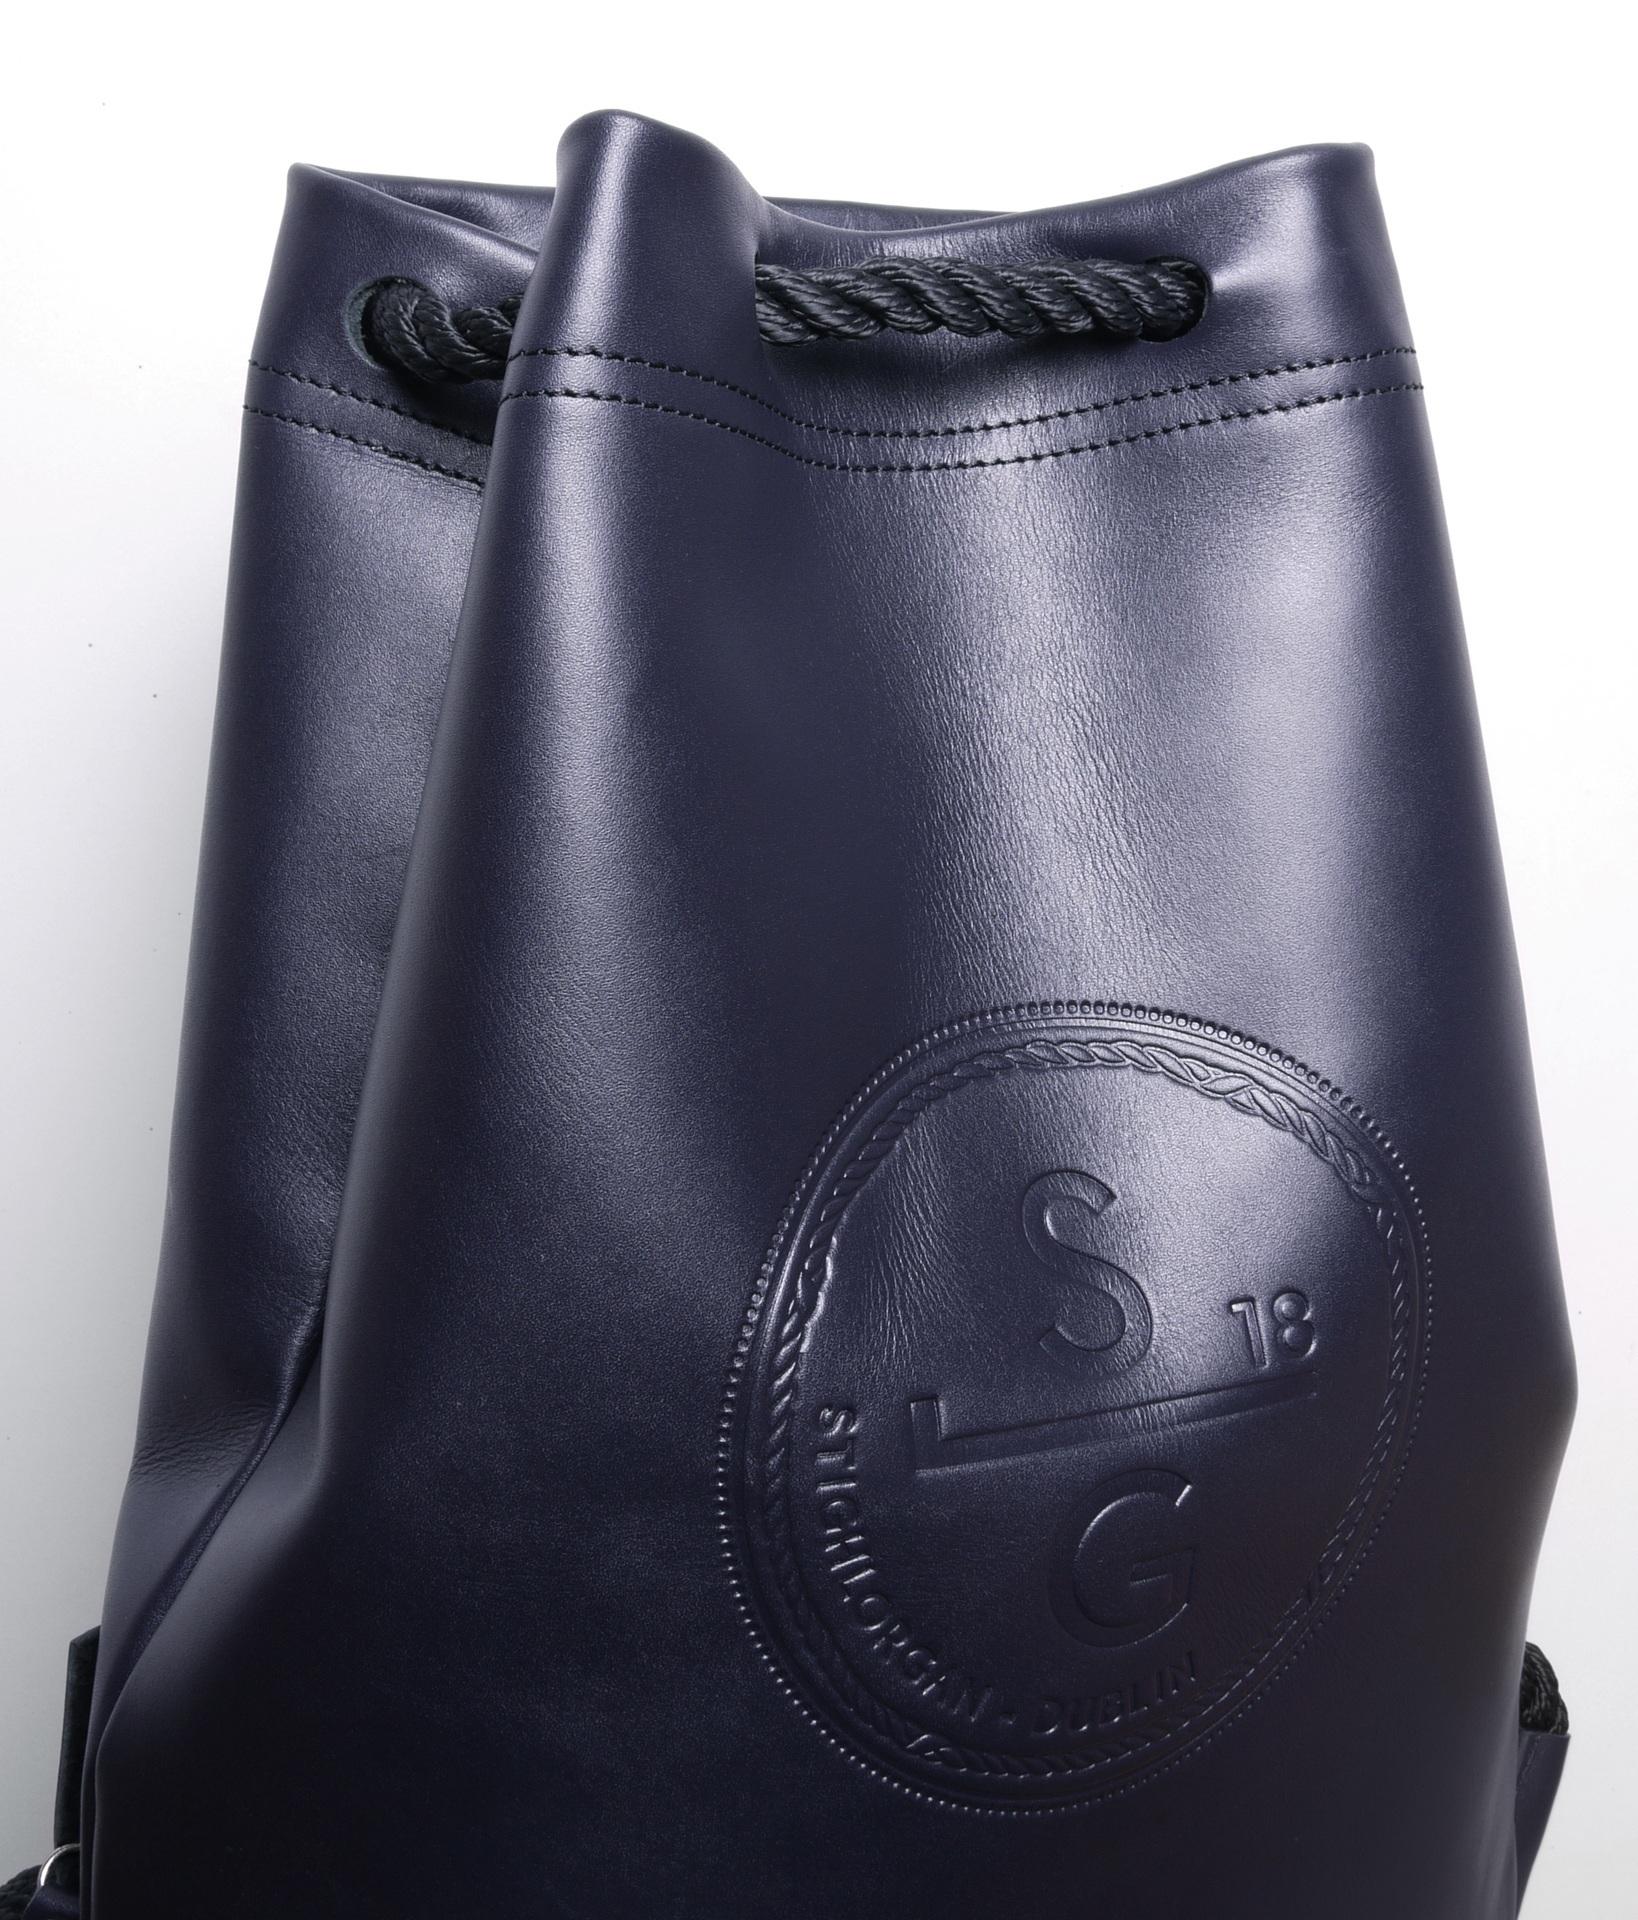 Stighlorgan - Driscoll leather drawstring bag - brown